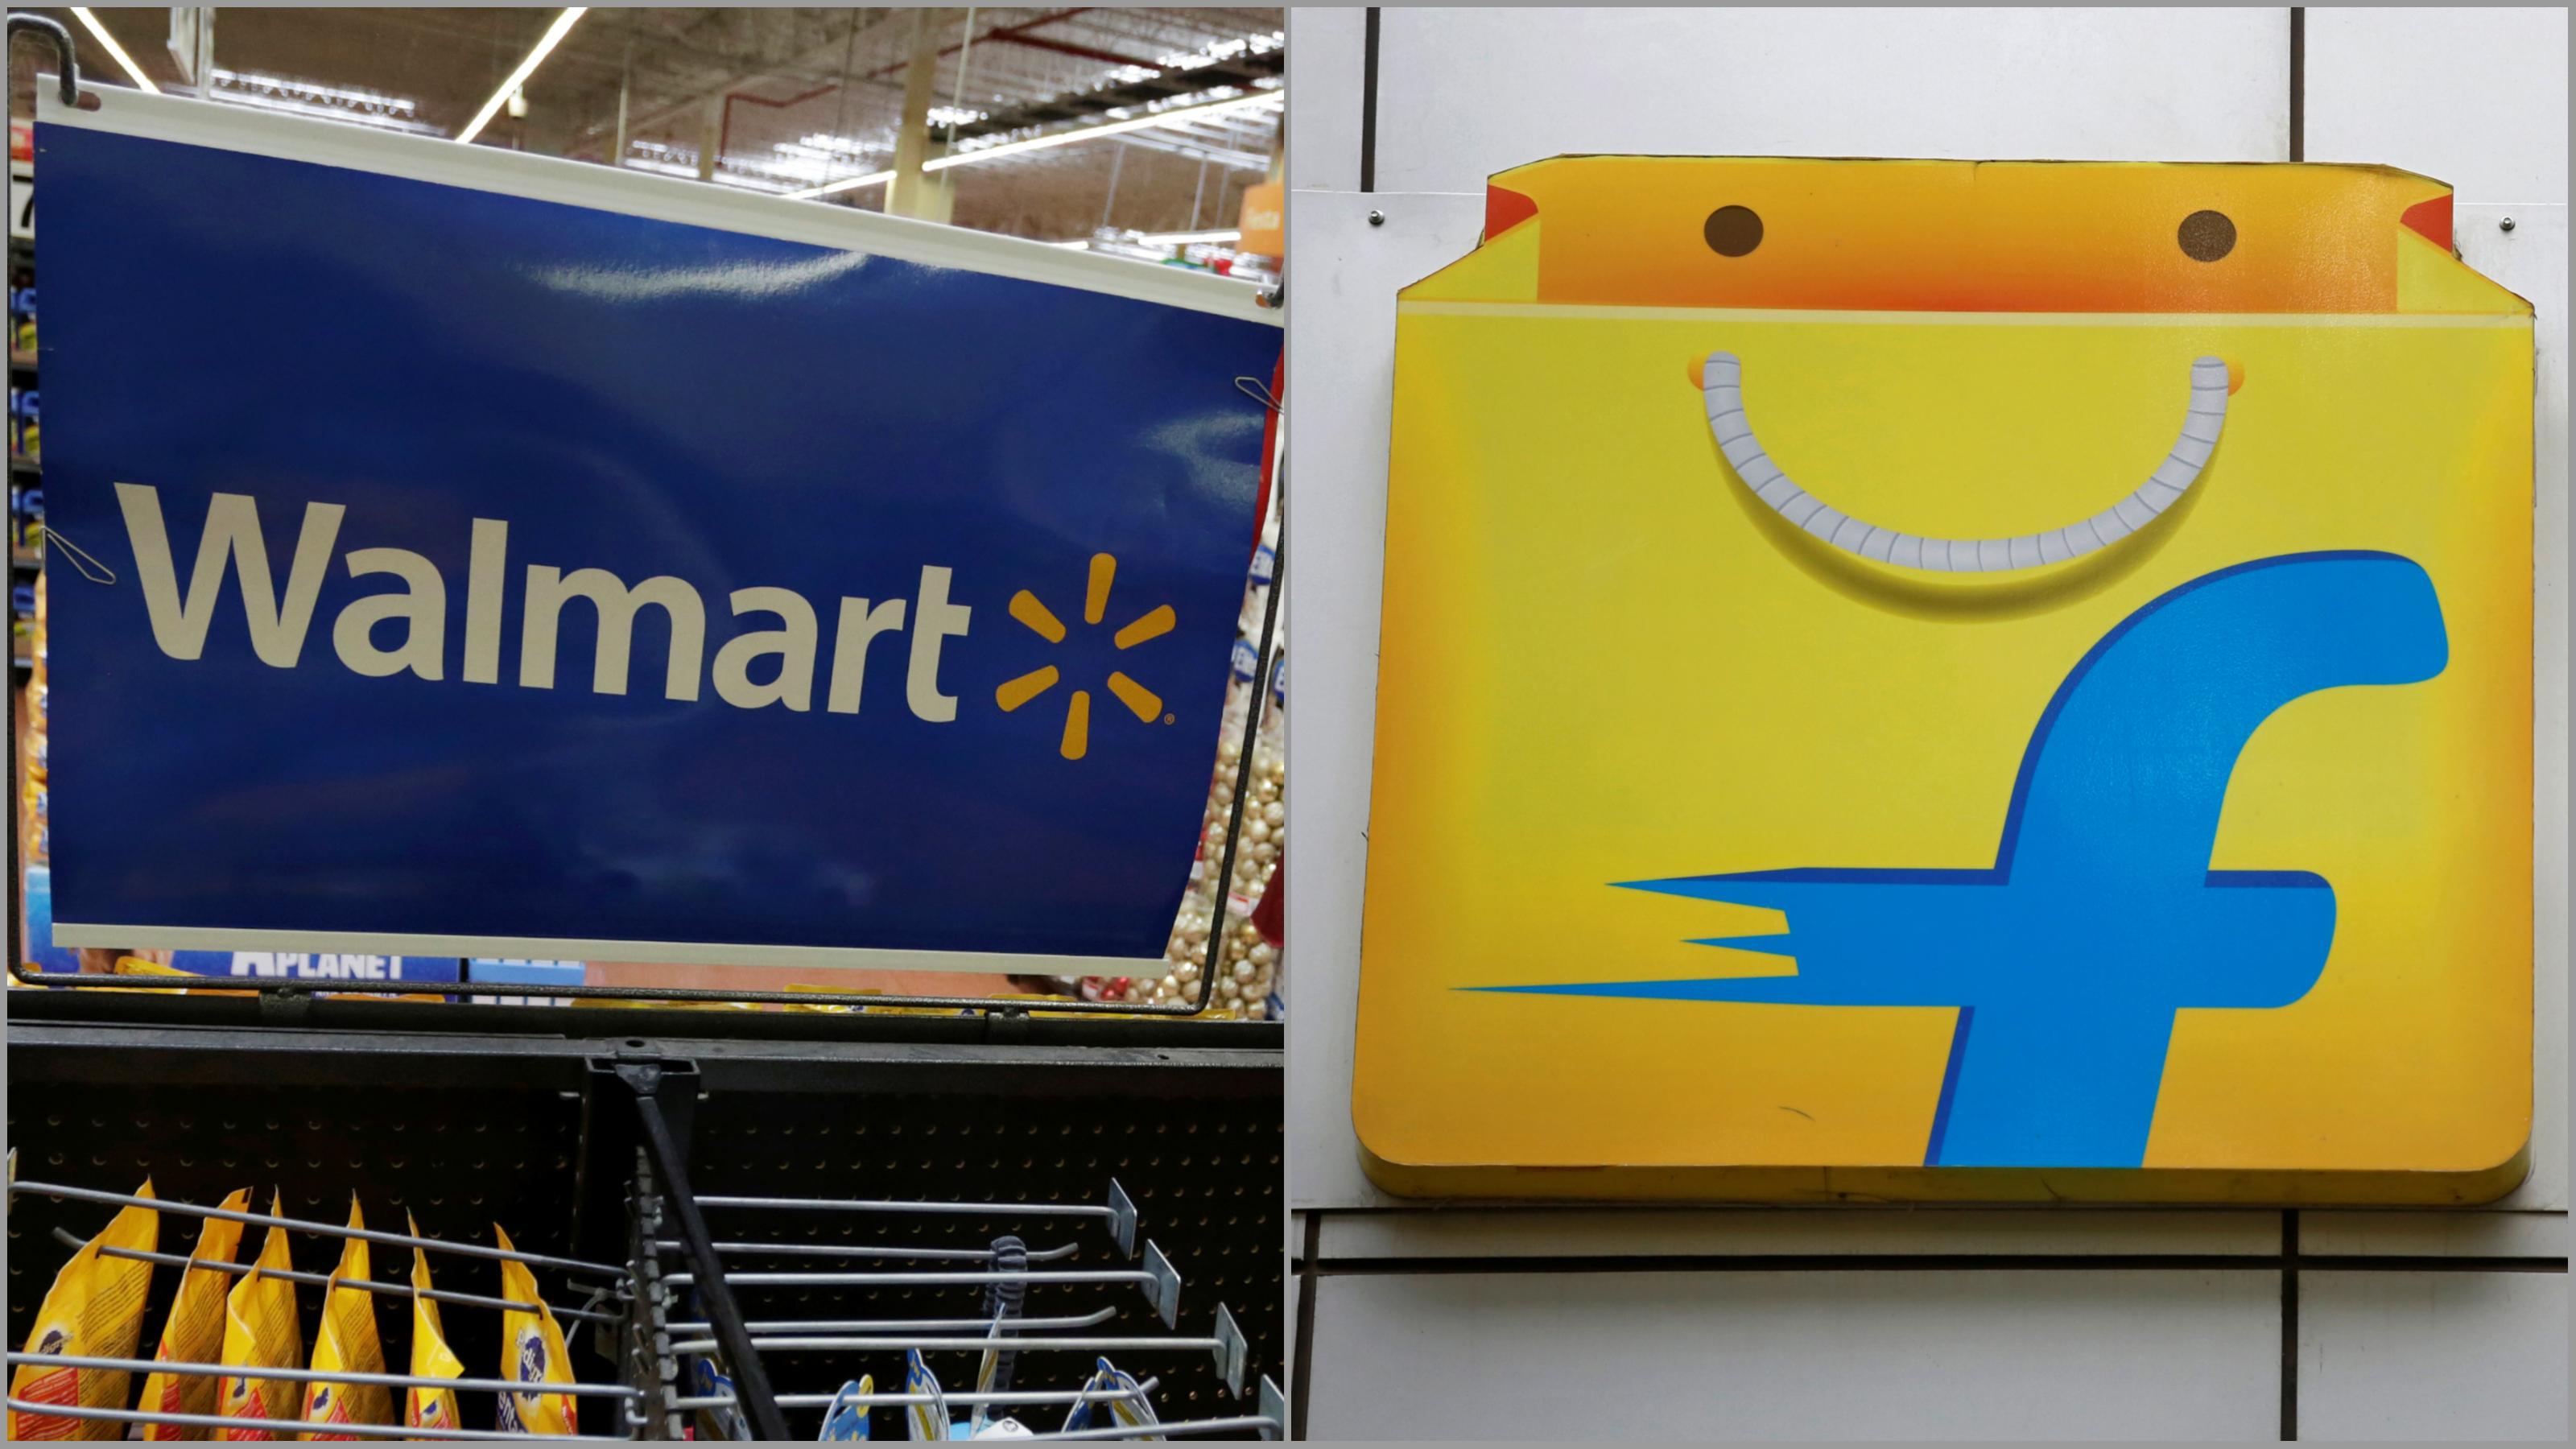 Walmart acquired Flipkart.